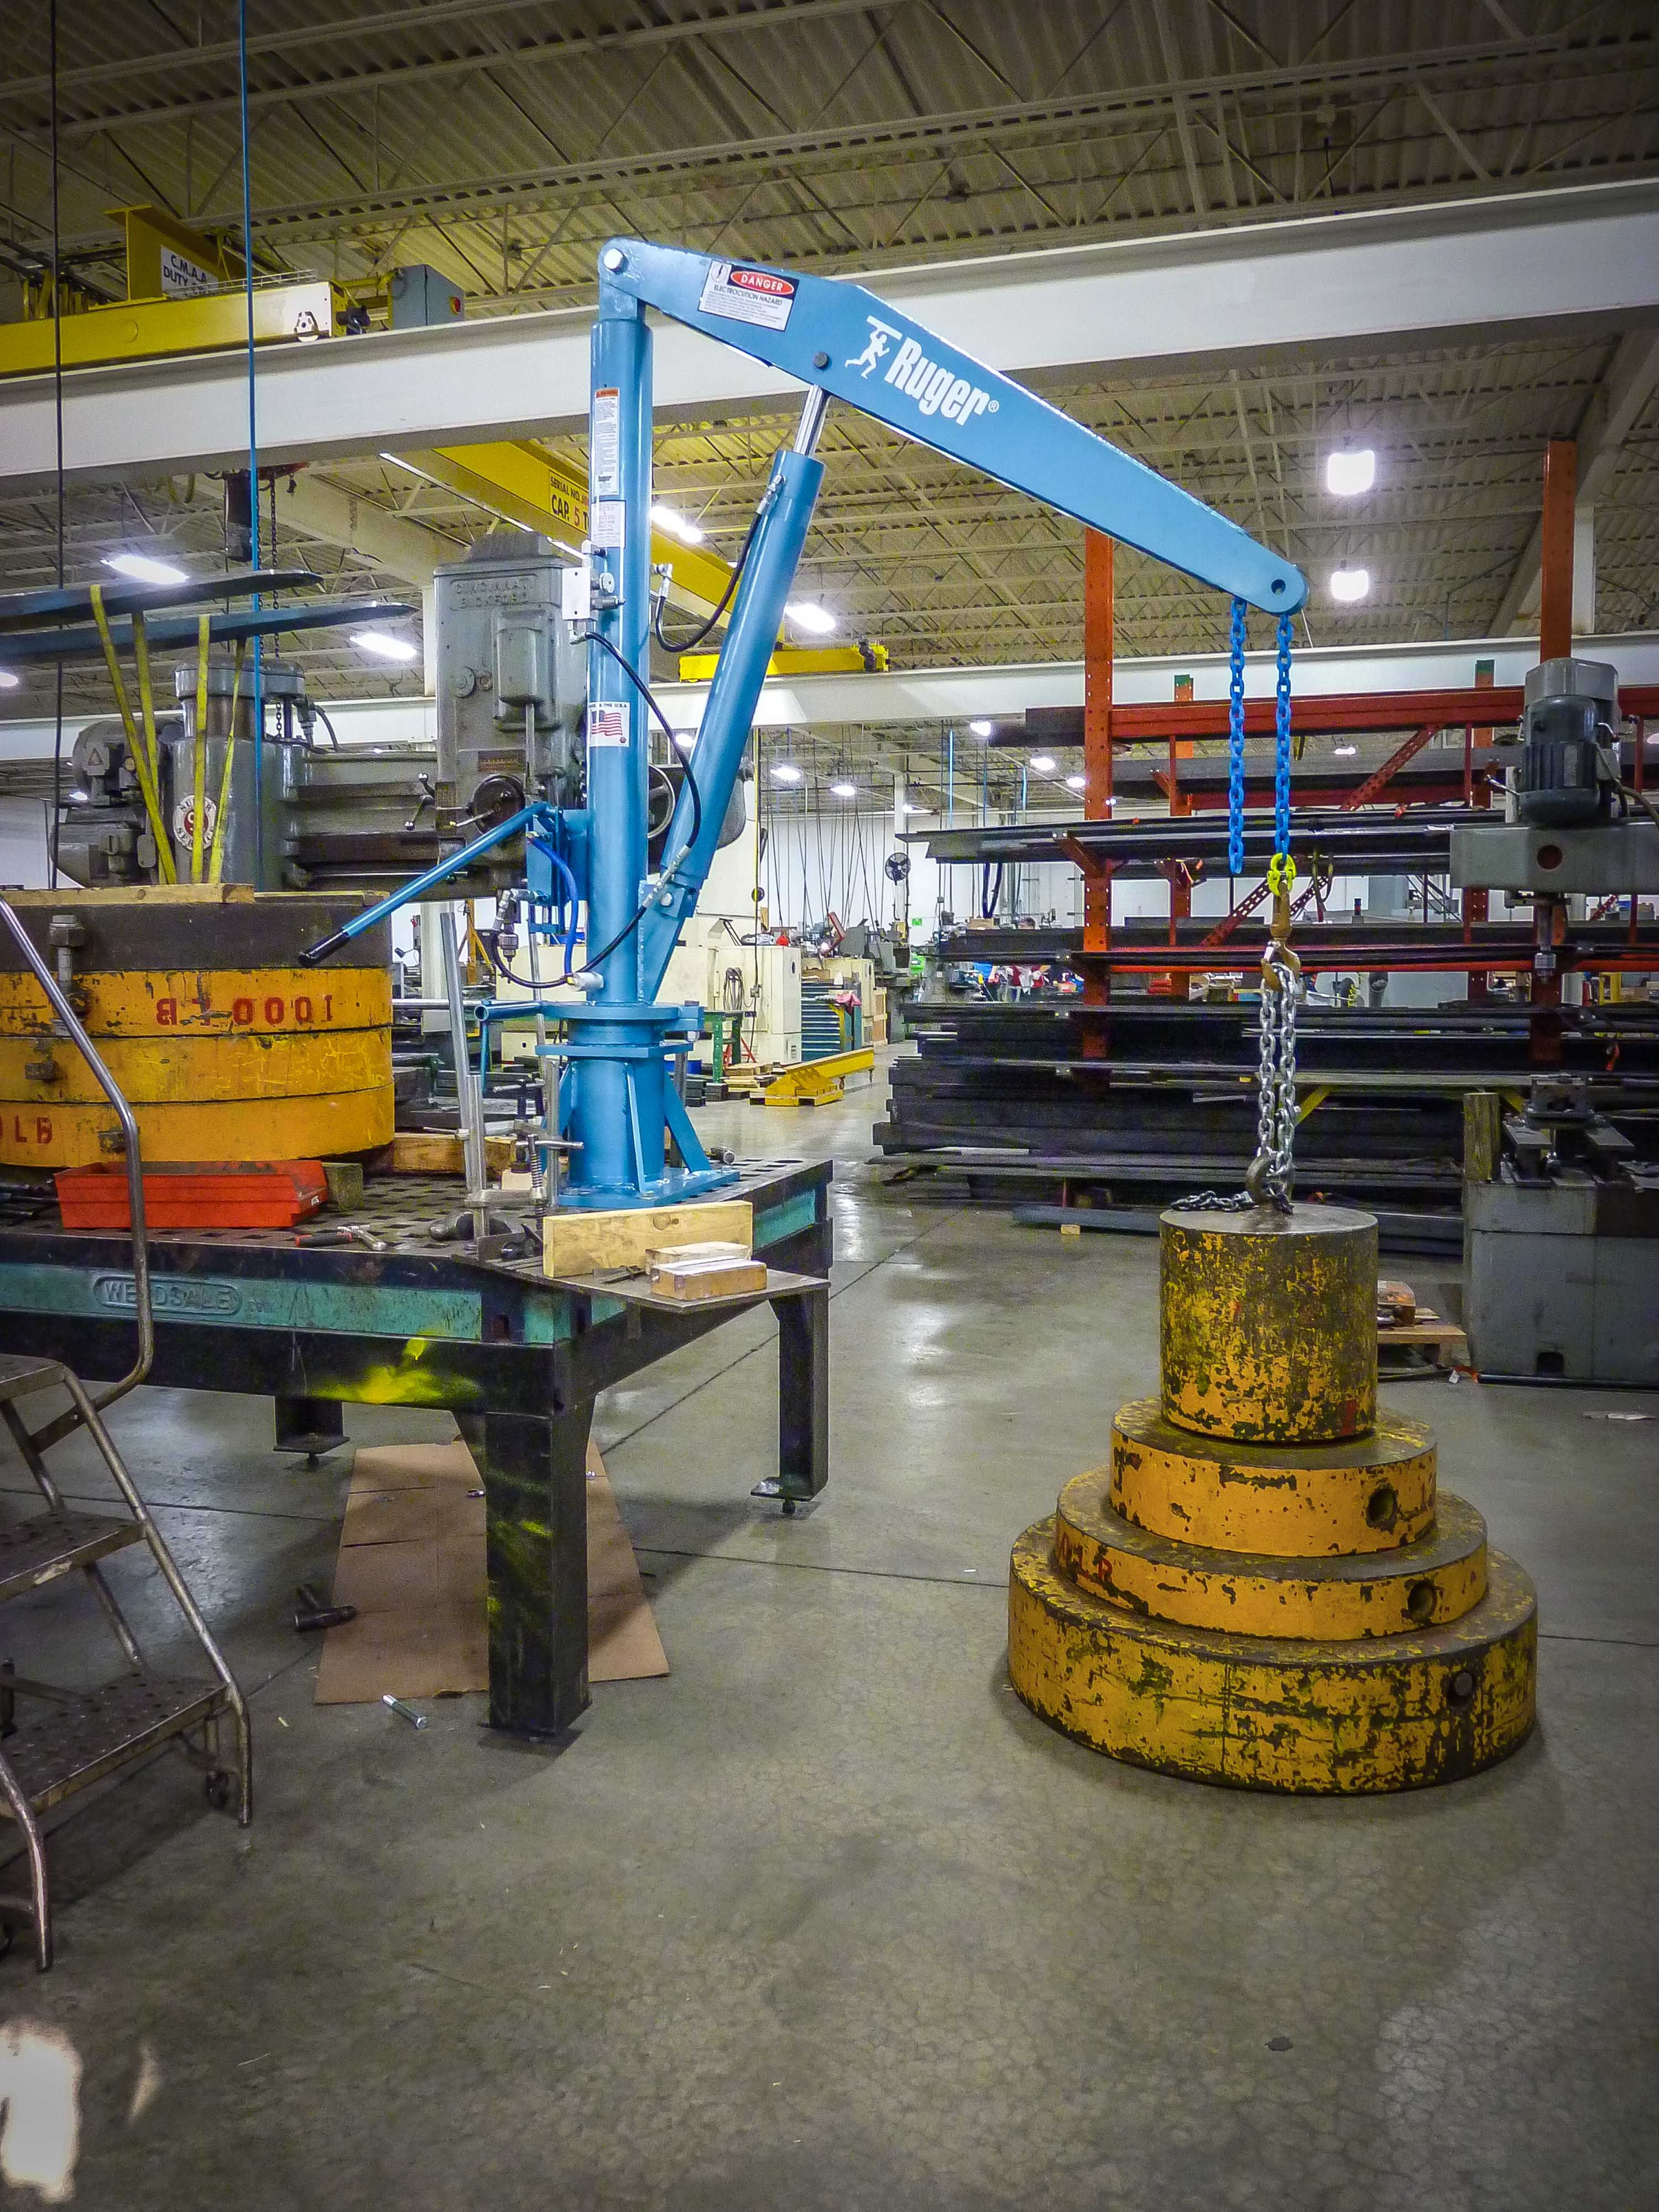 Truck Mounted Crane Trucks, Fabrication tools, Welding bench